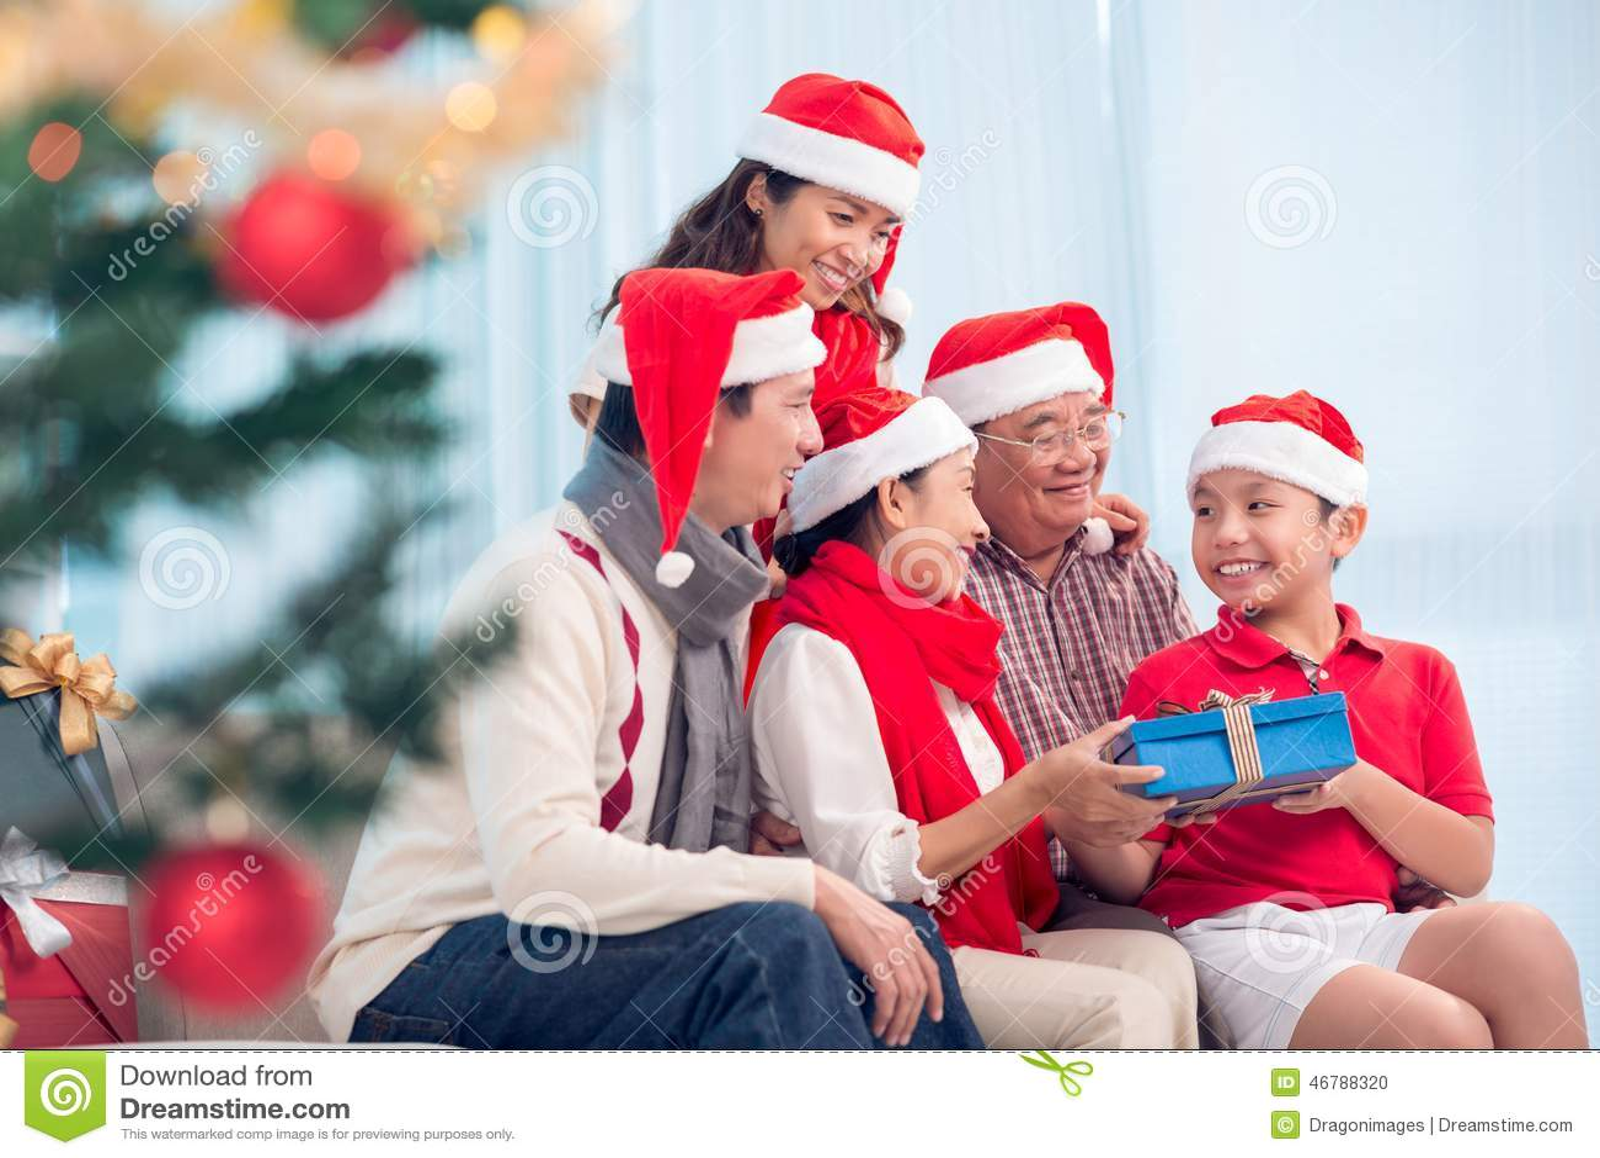 Christmas Gift Exchange Ideas  ThriftyFun